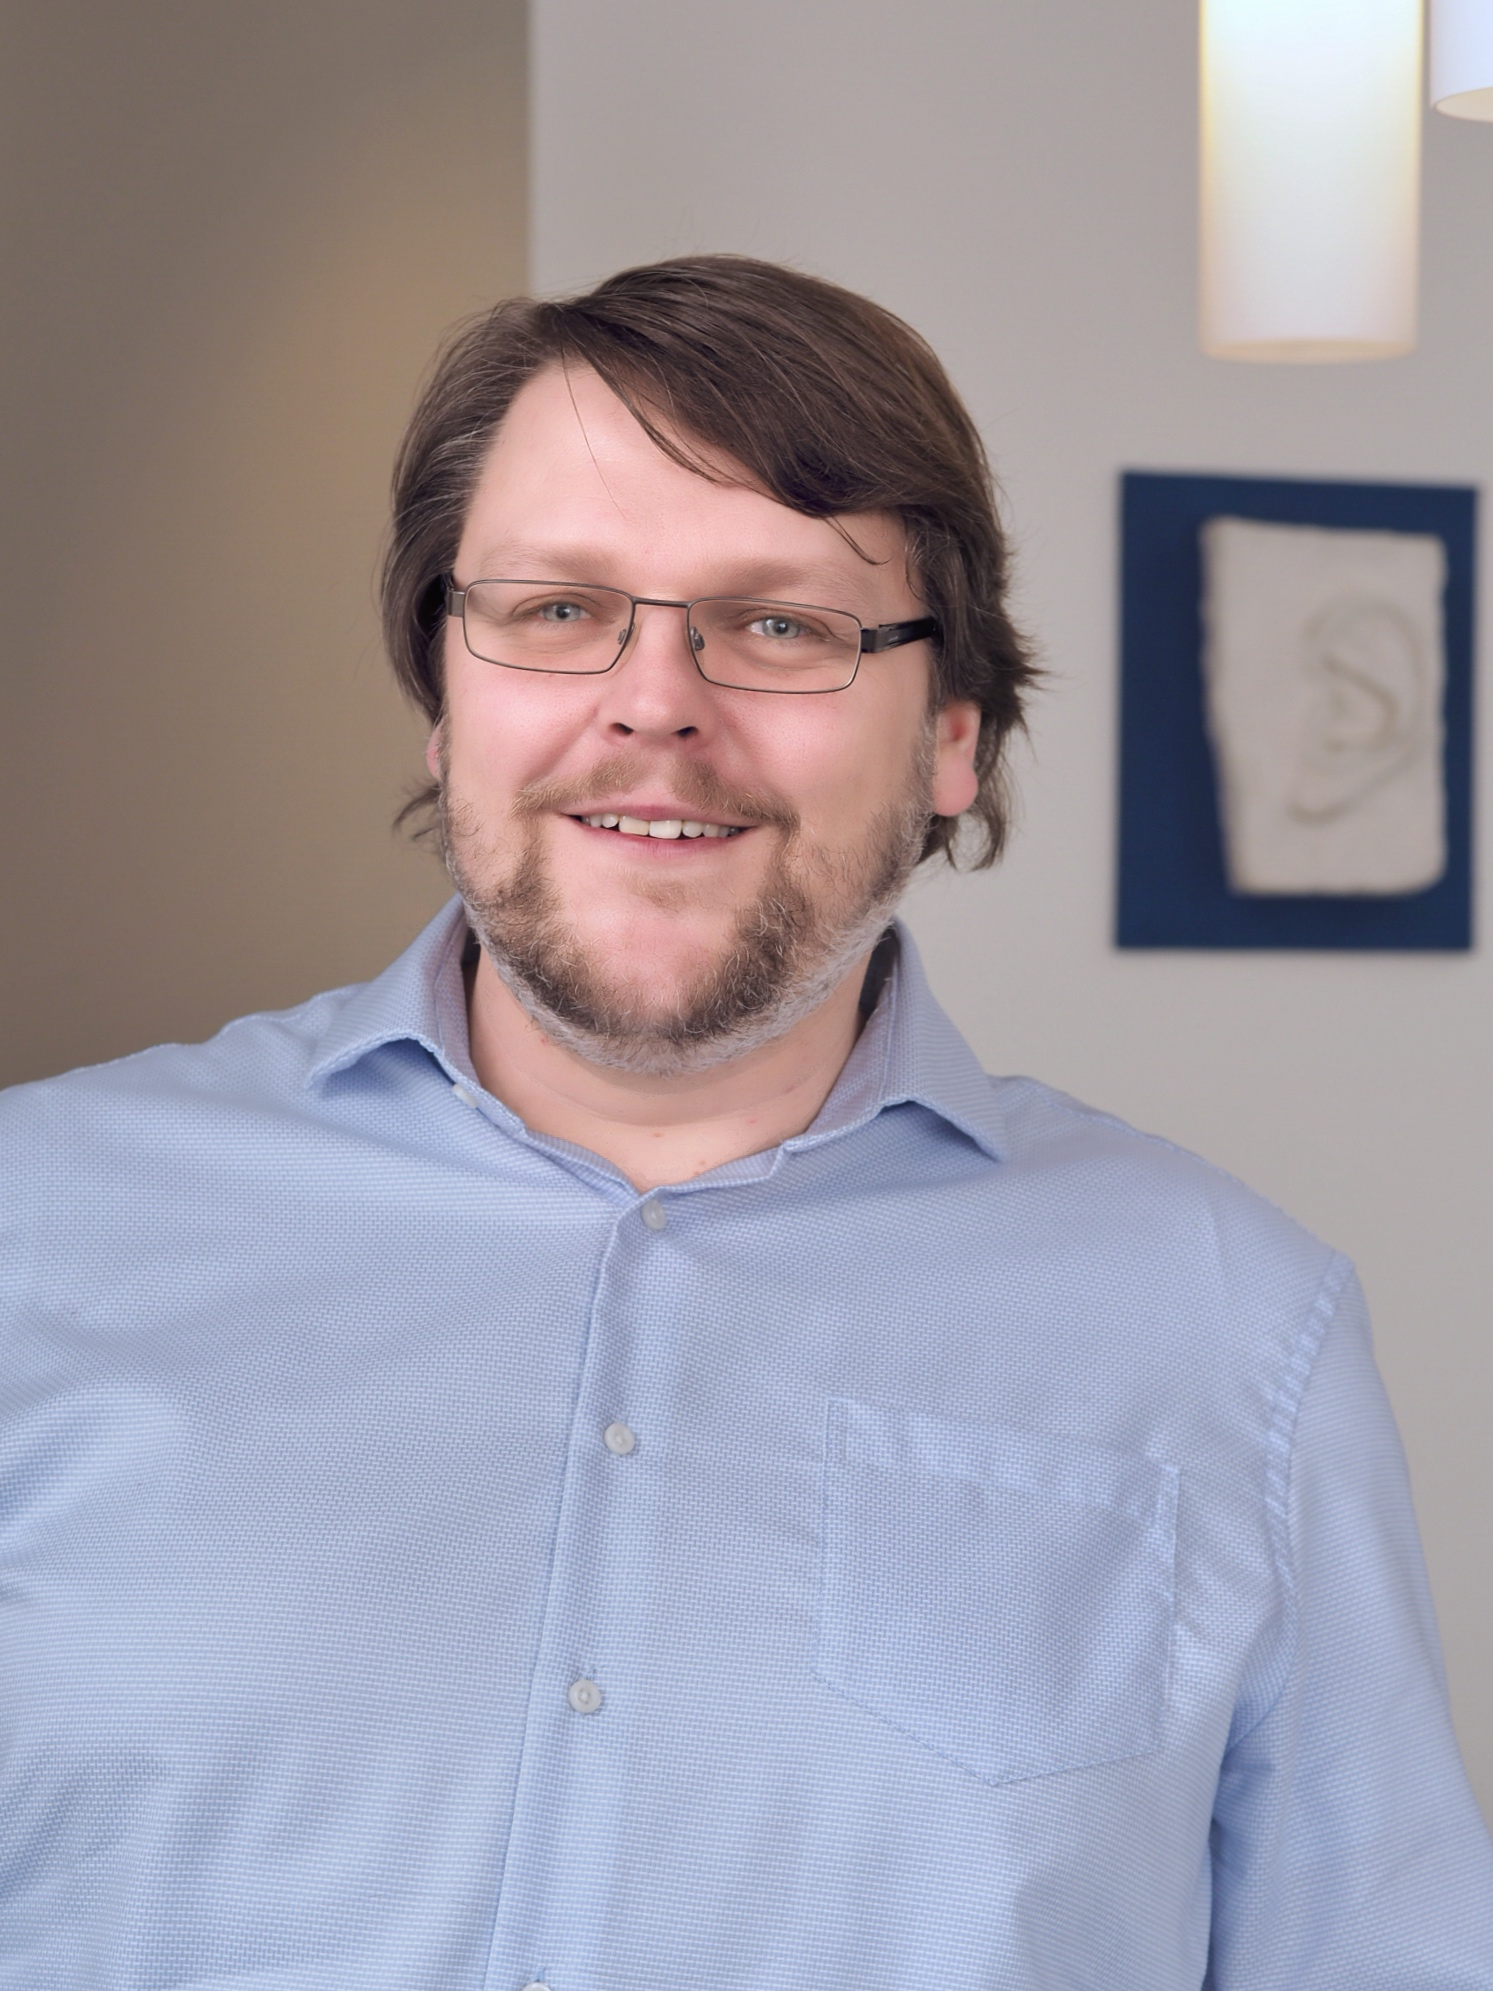 Facharzt Michael Mustroph